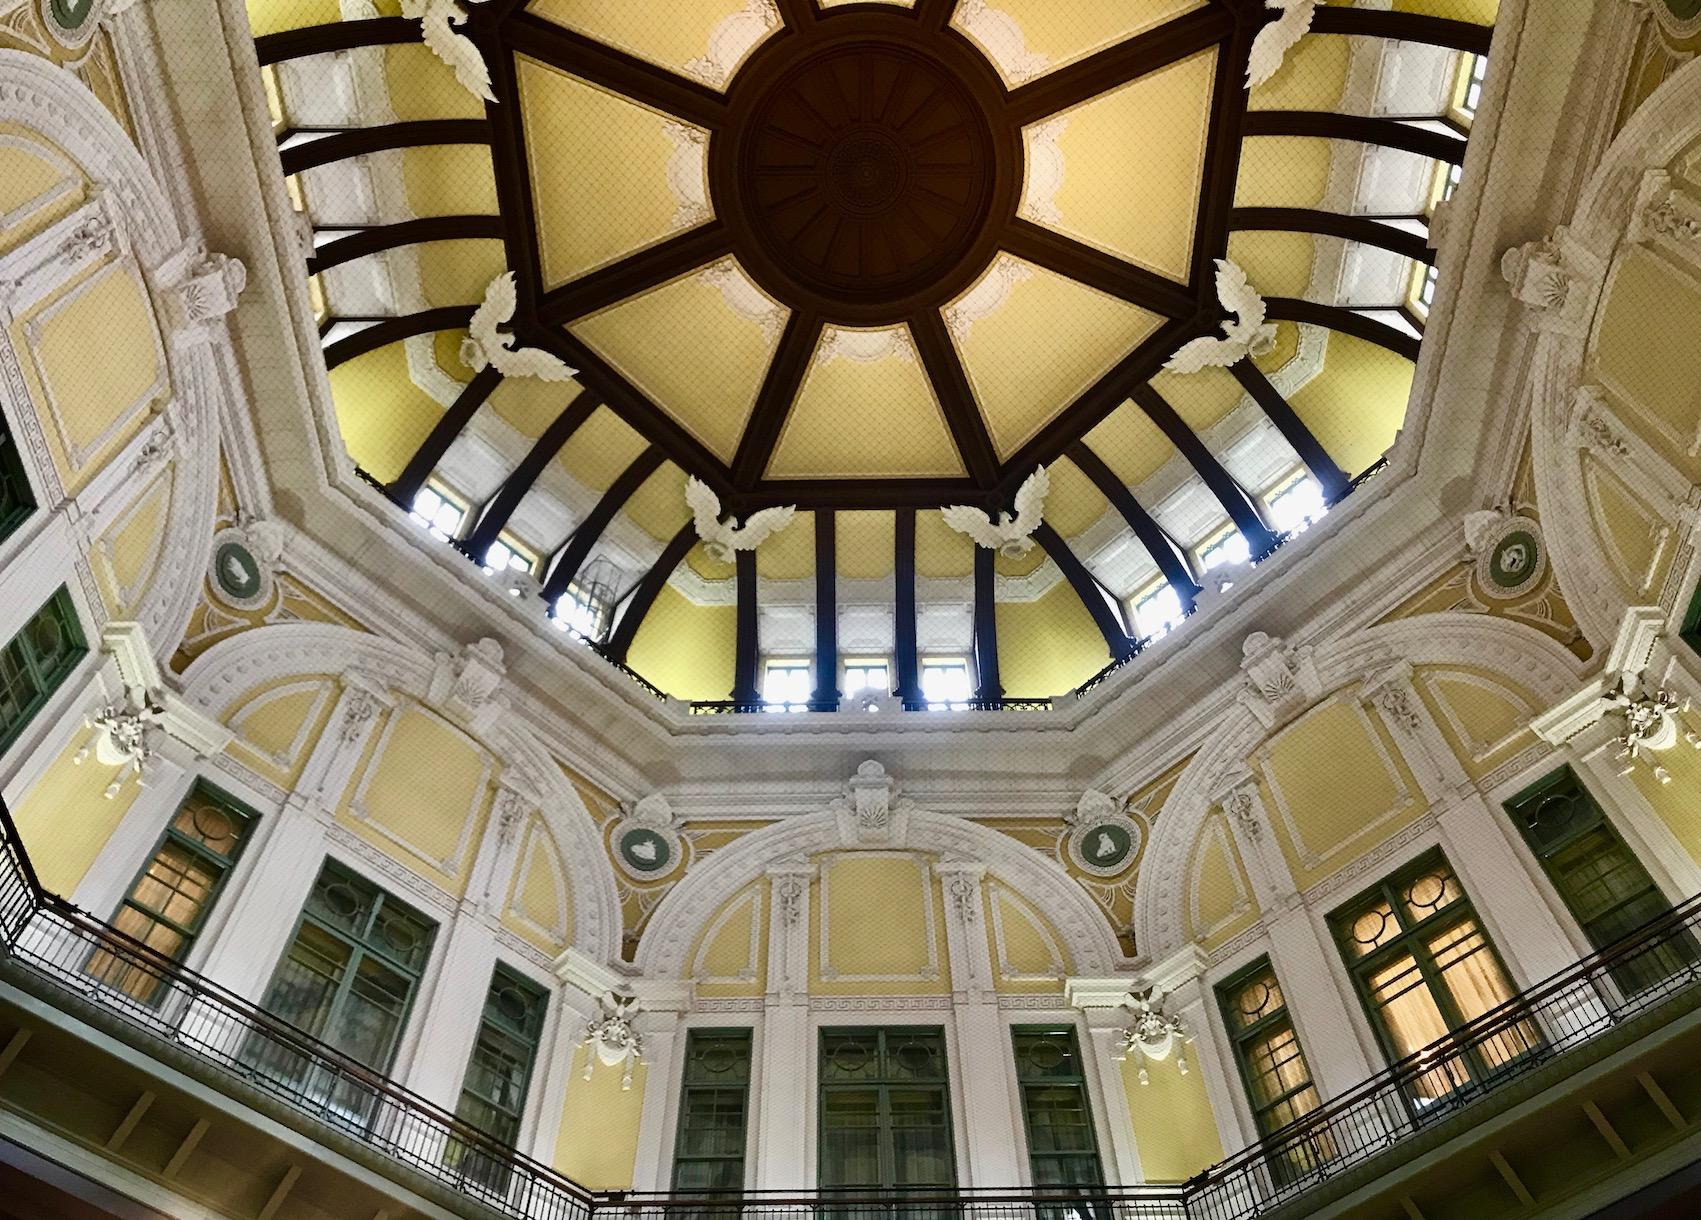 Domed ceiling Marunouchi Gate Tokyo Station.